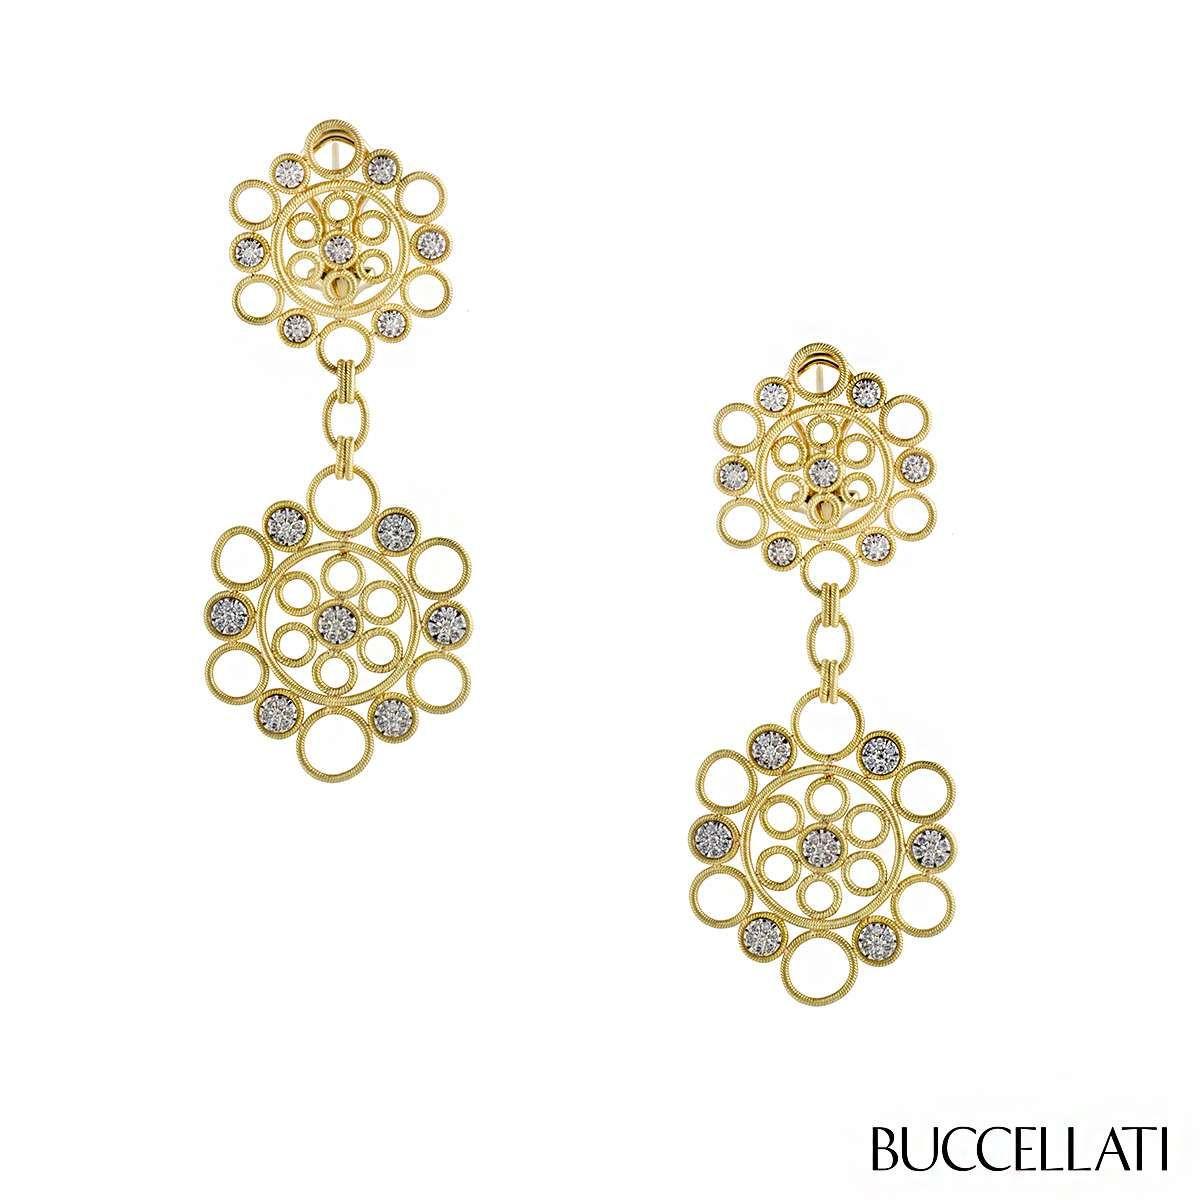 Buccellati Rombi Diamond Drop Earrings 5xv9V2BQFm